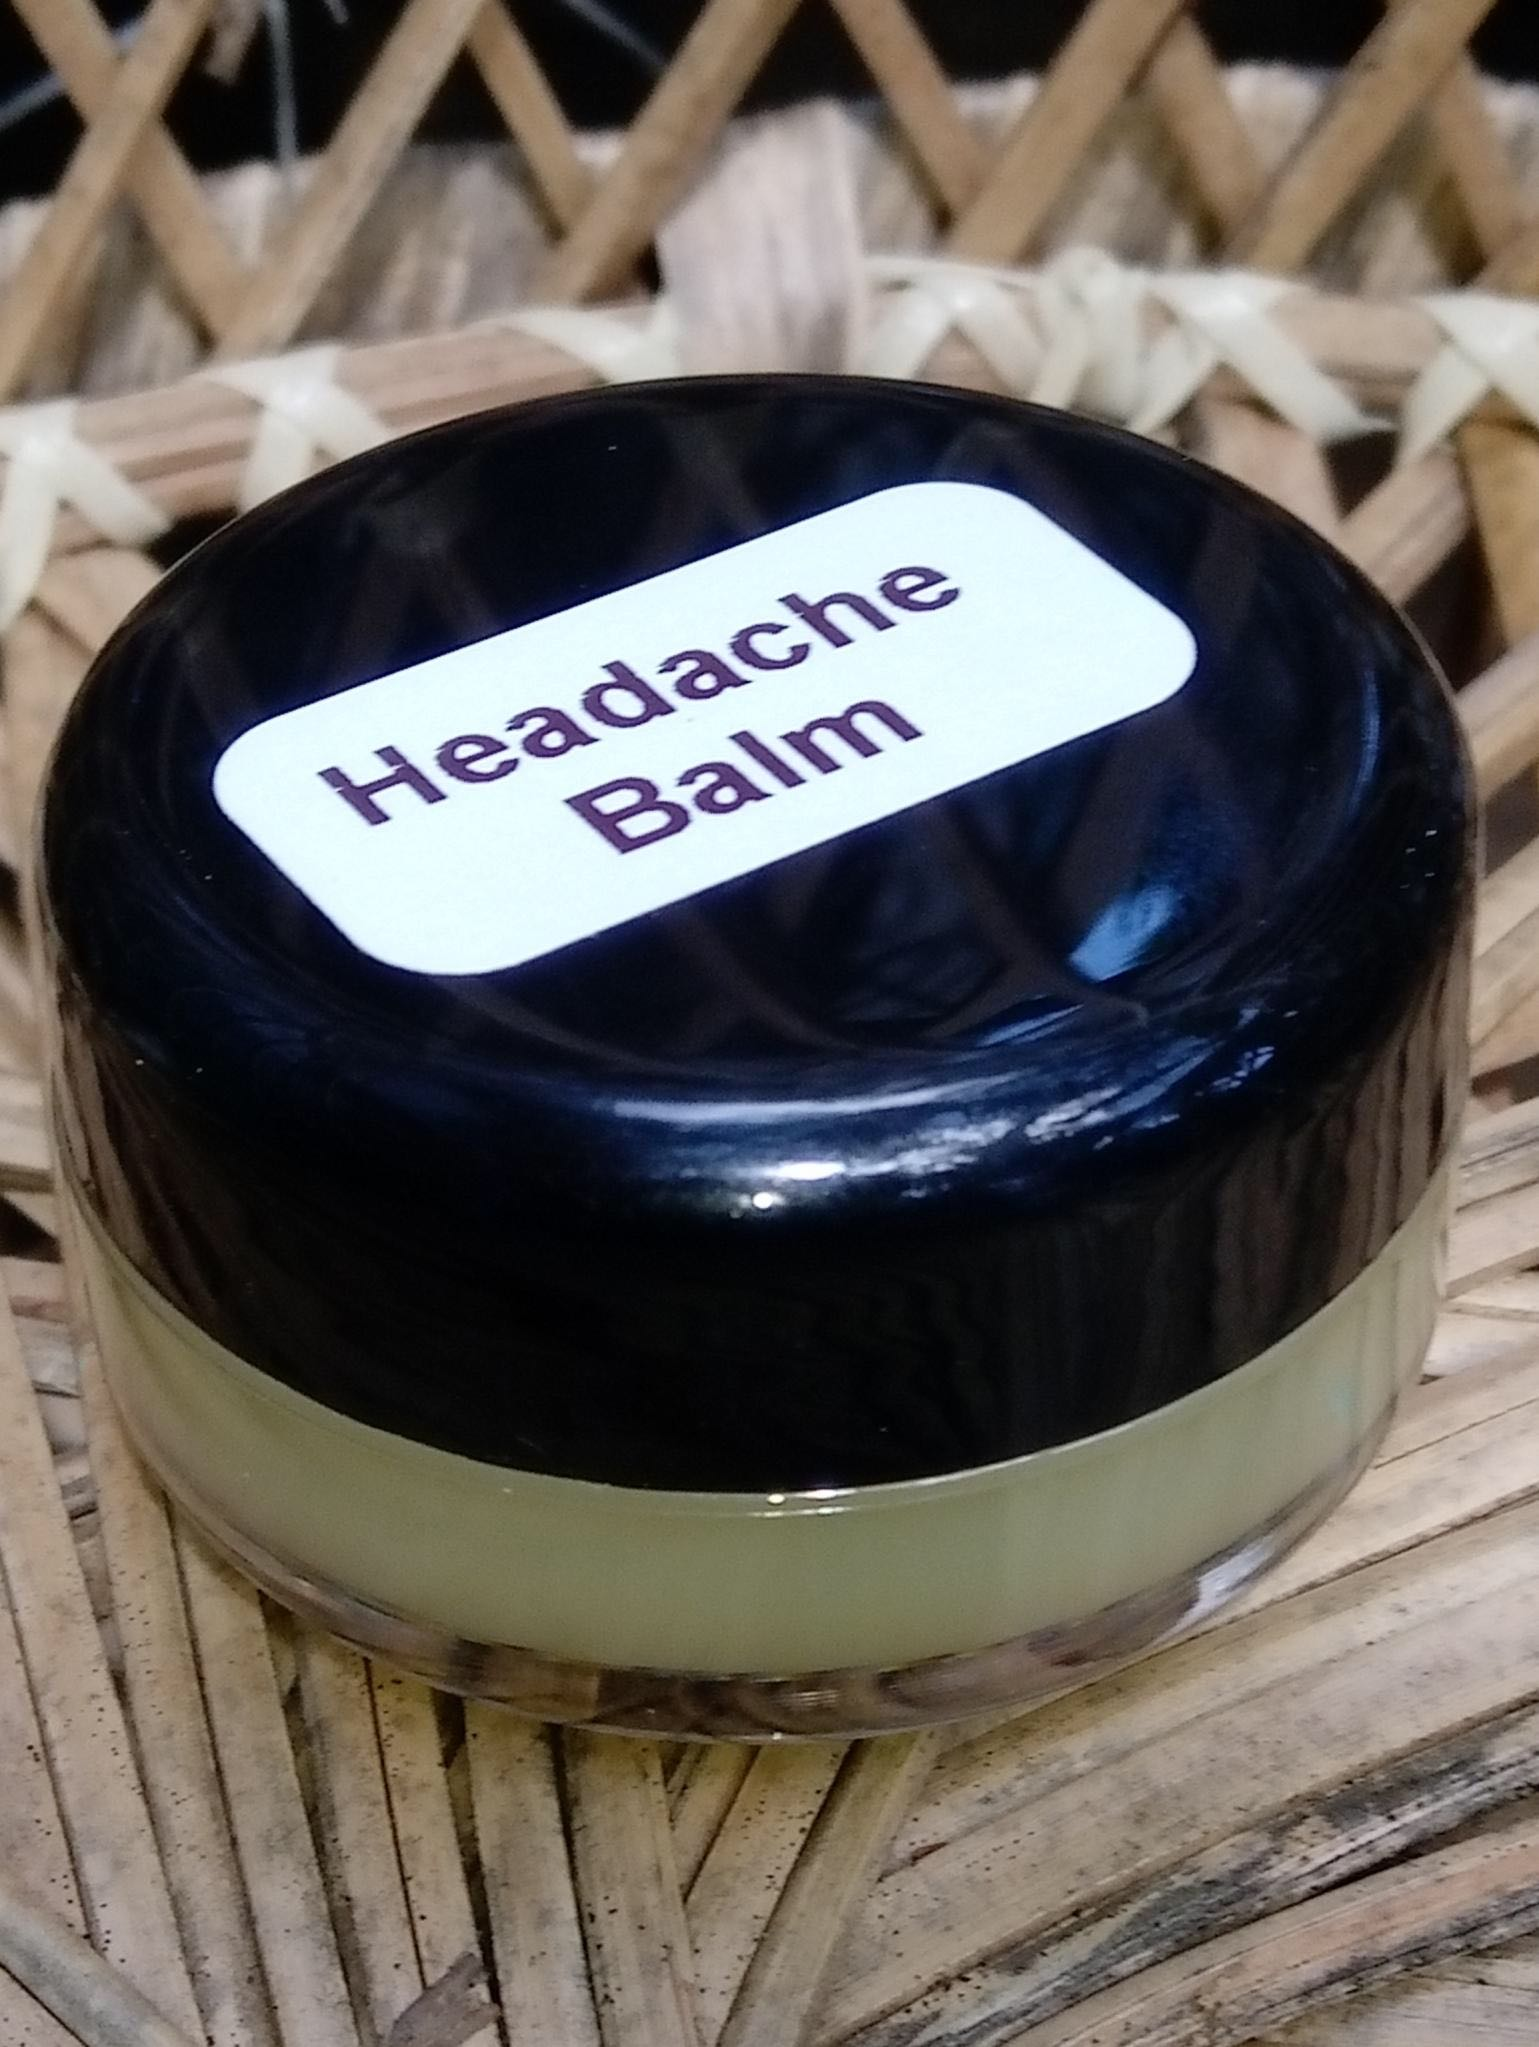 Photograph of an Headache Balm product